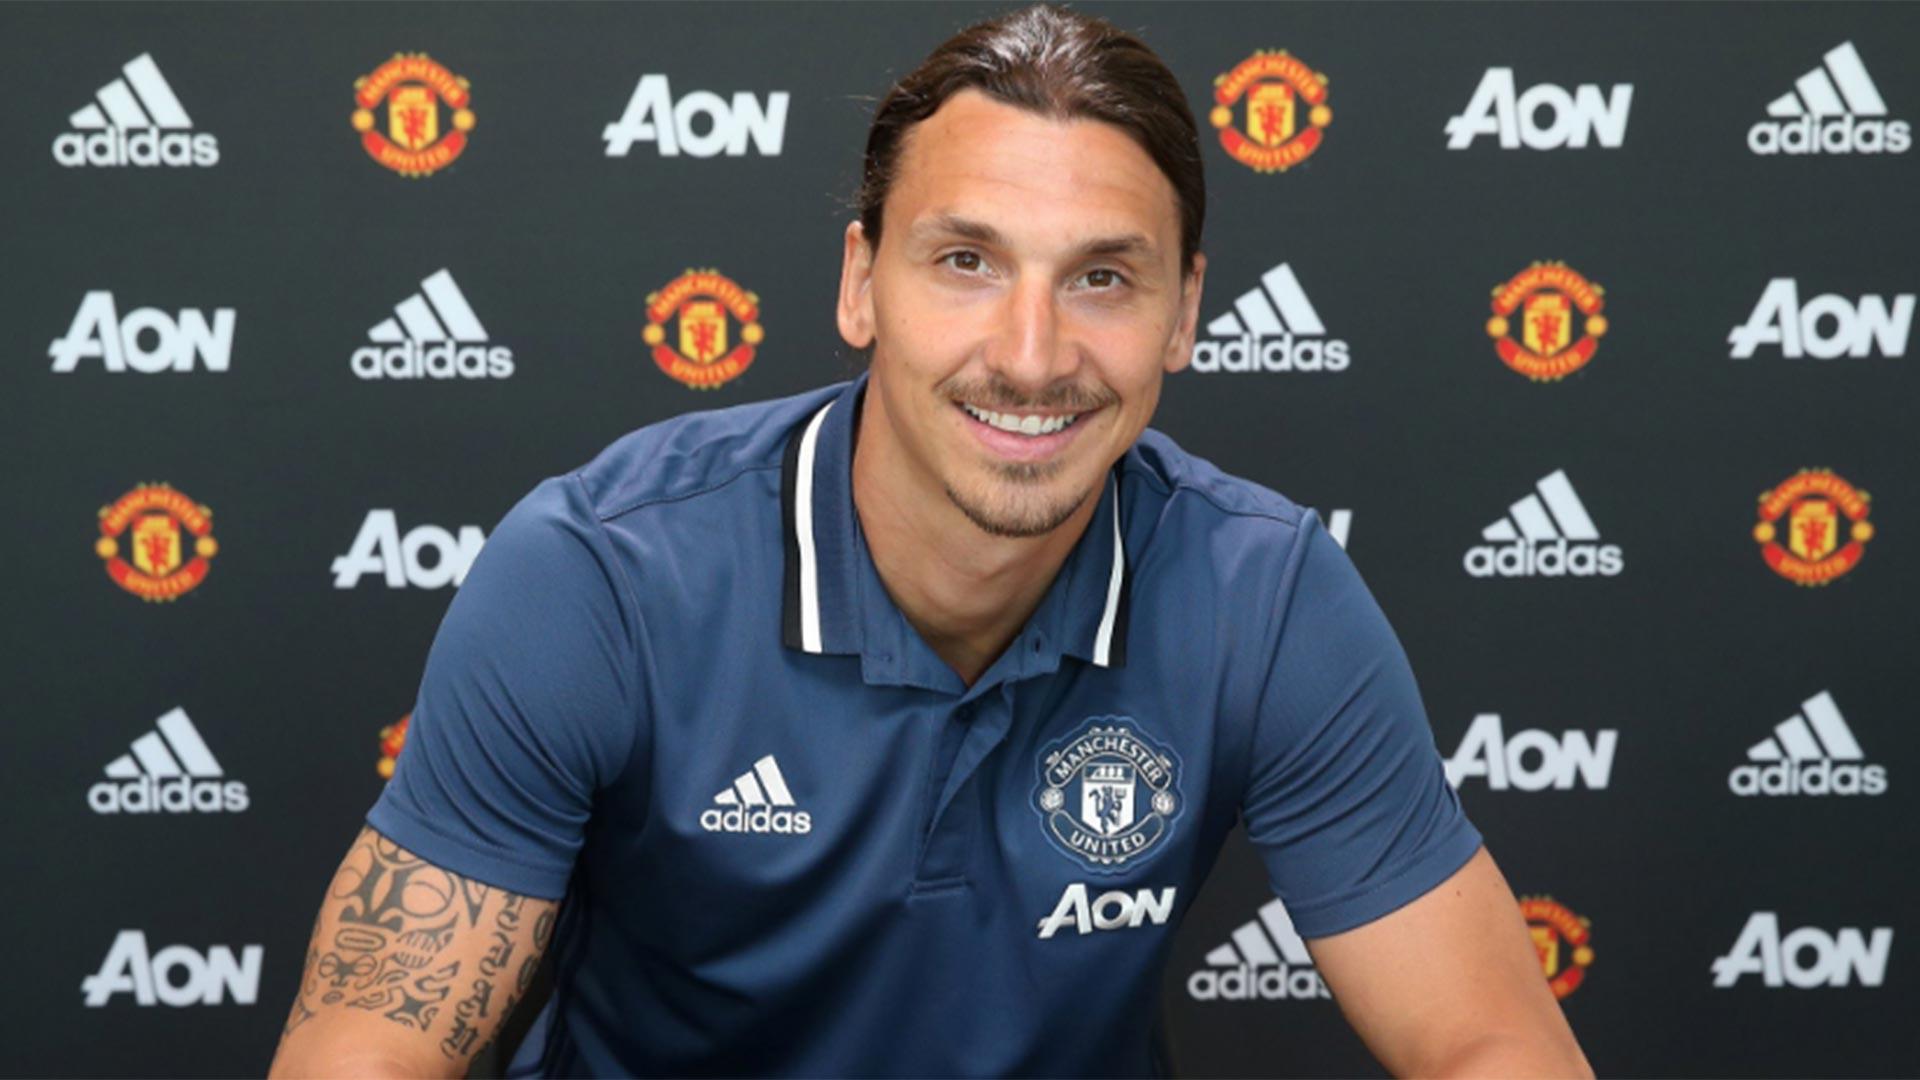 Zlatan Ibrahimovic anunció su pase al Manchester United